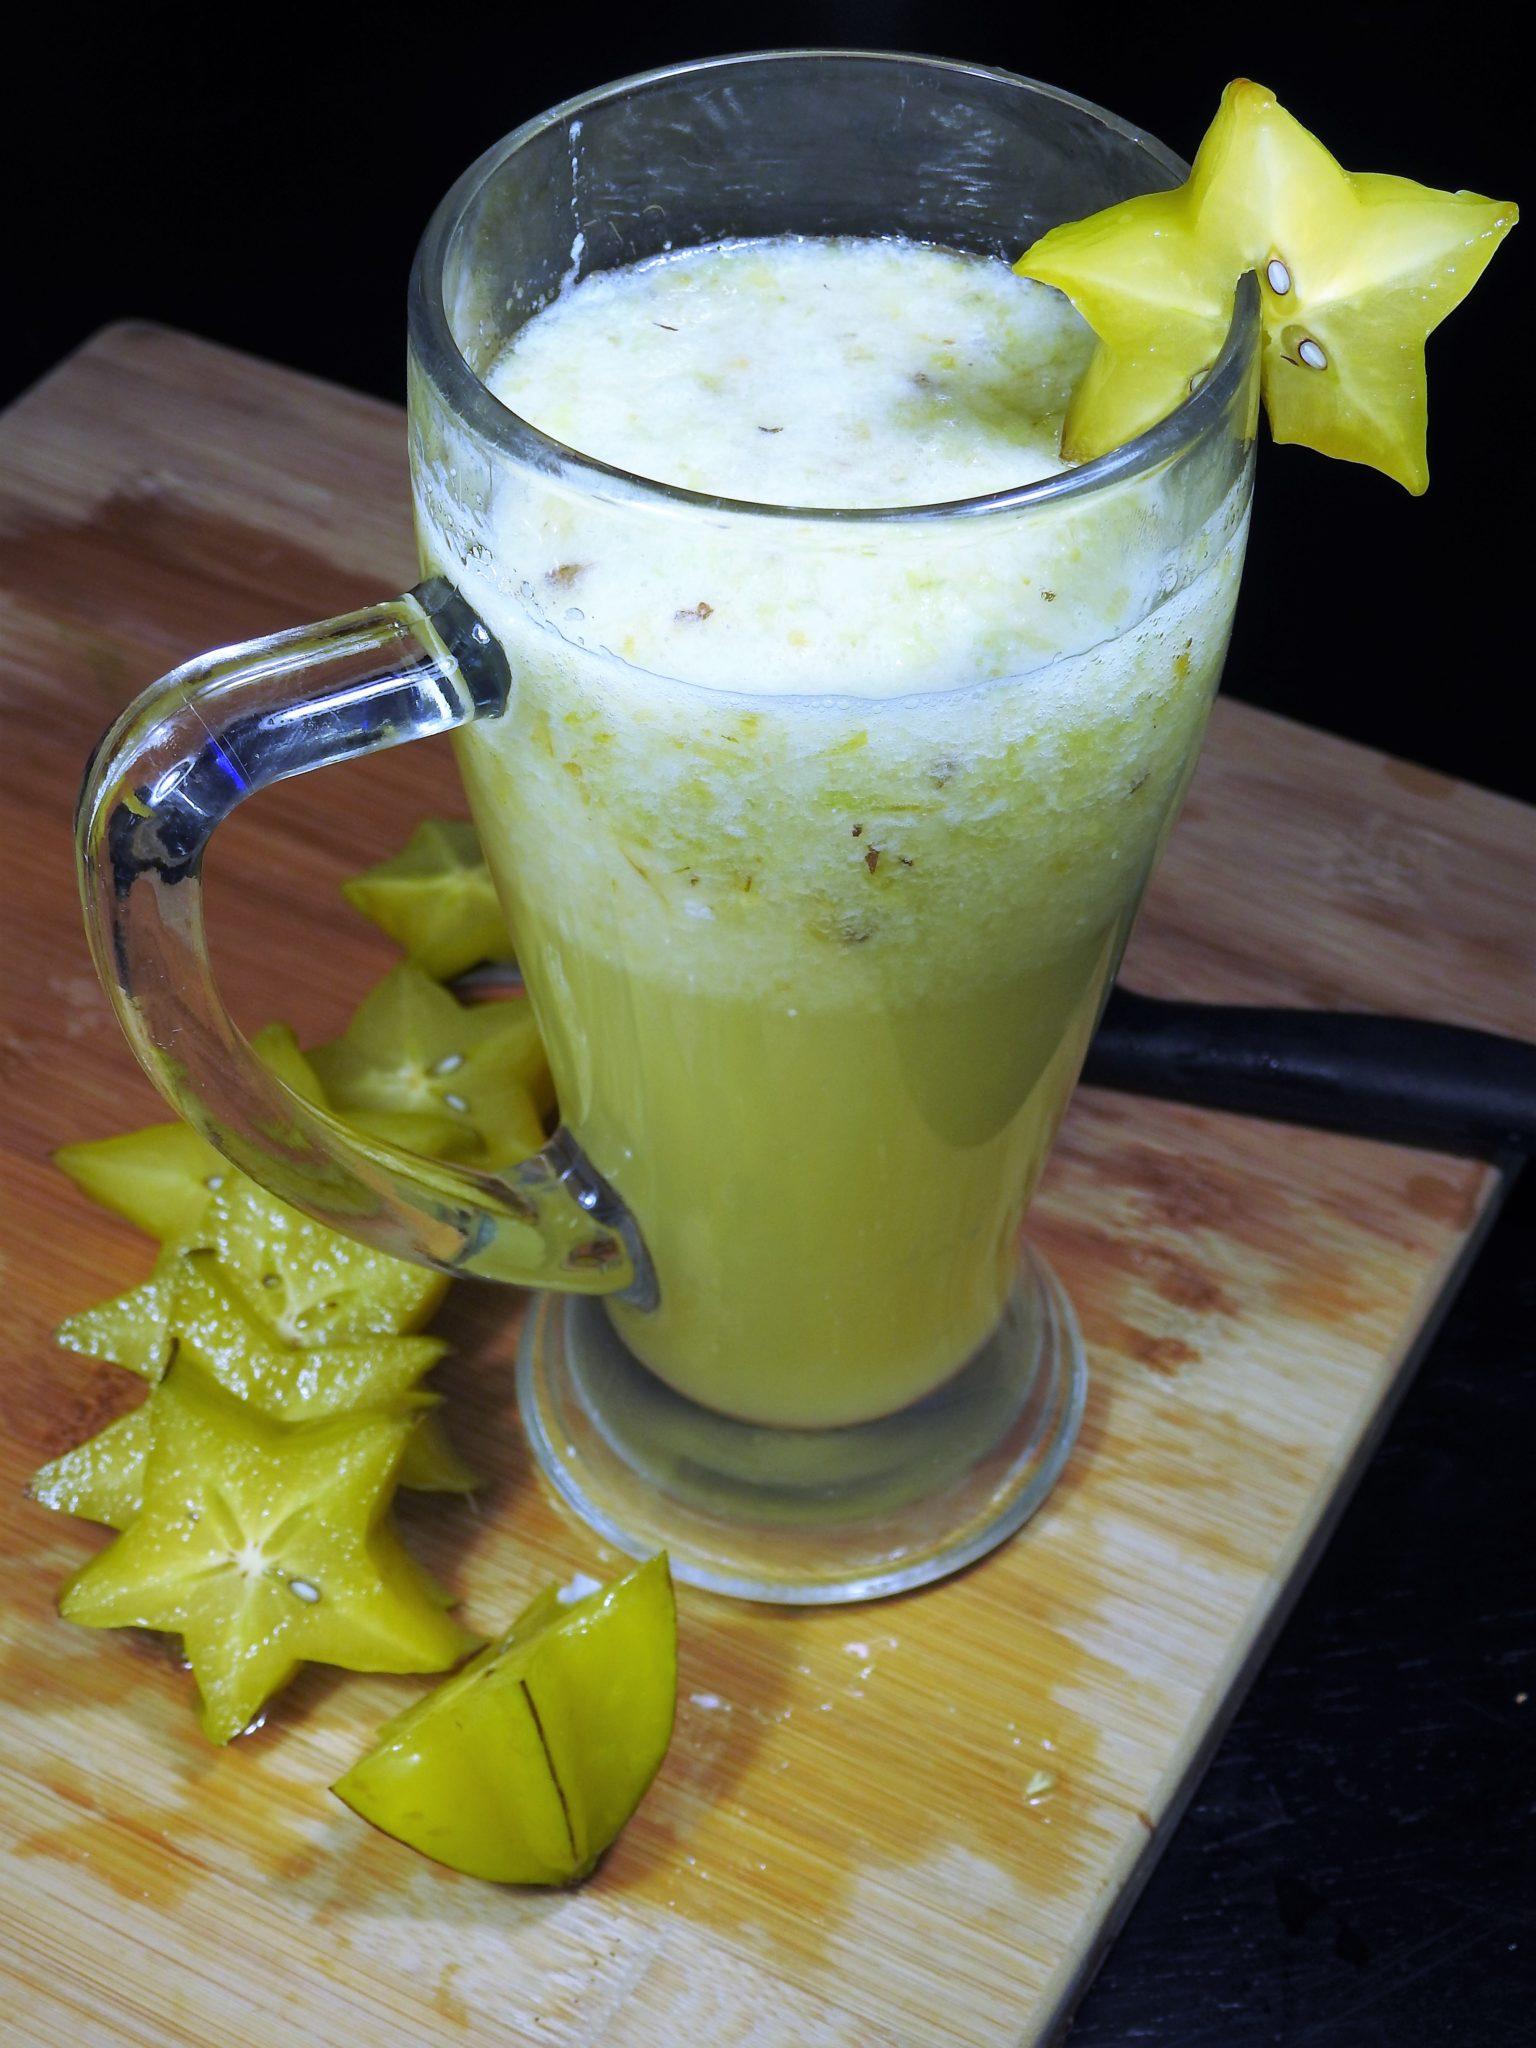 Starfruit Energy Juice Drink